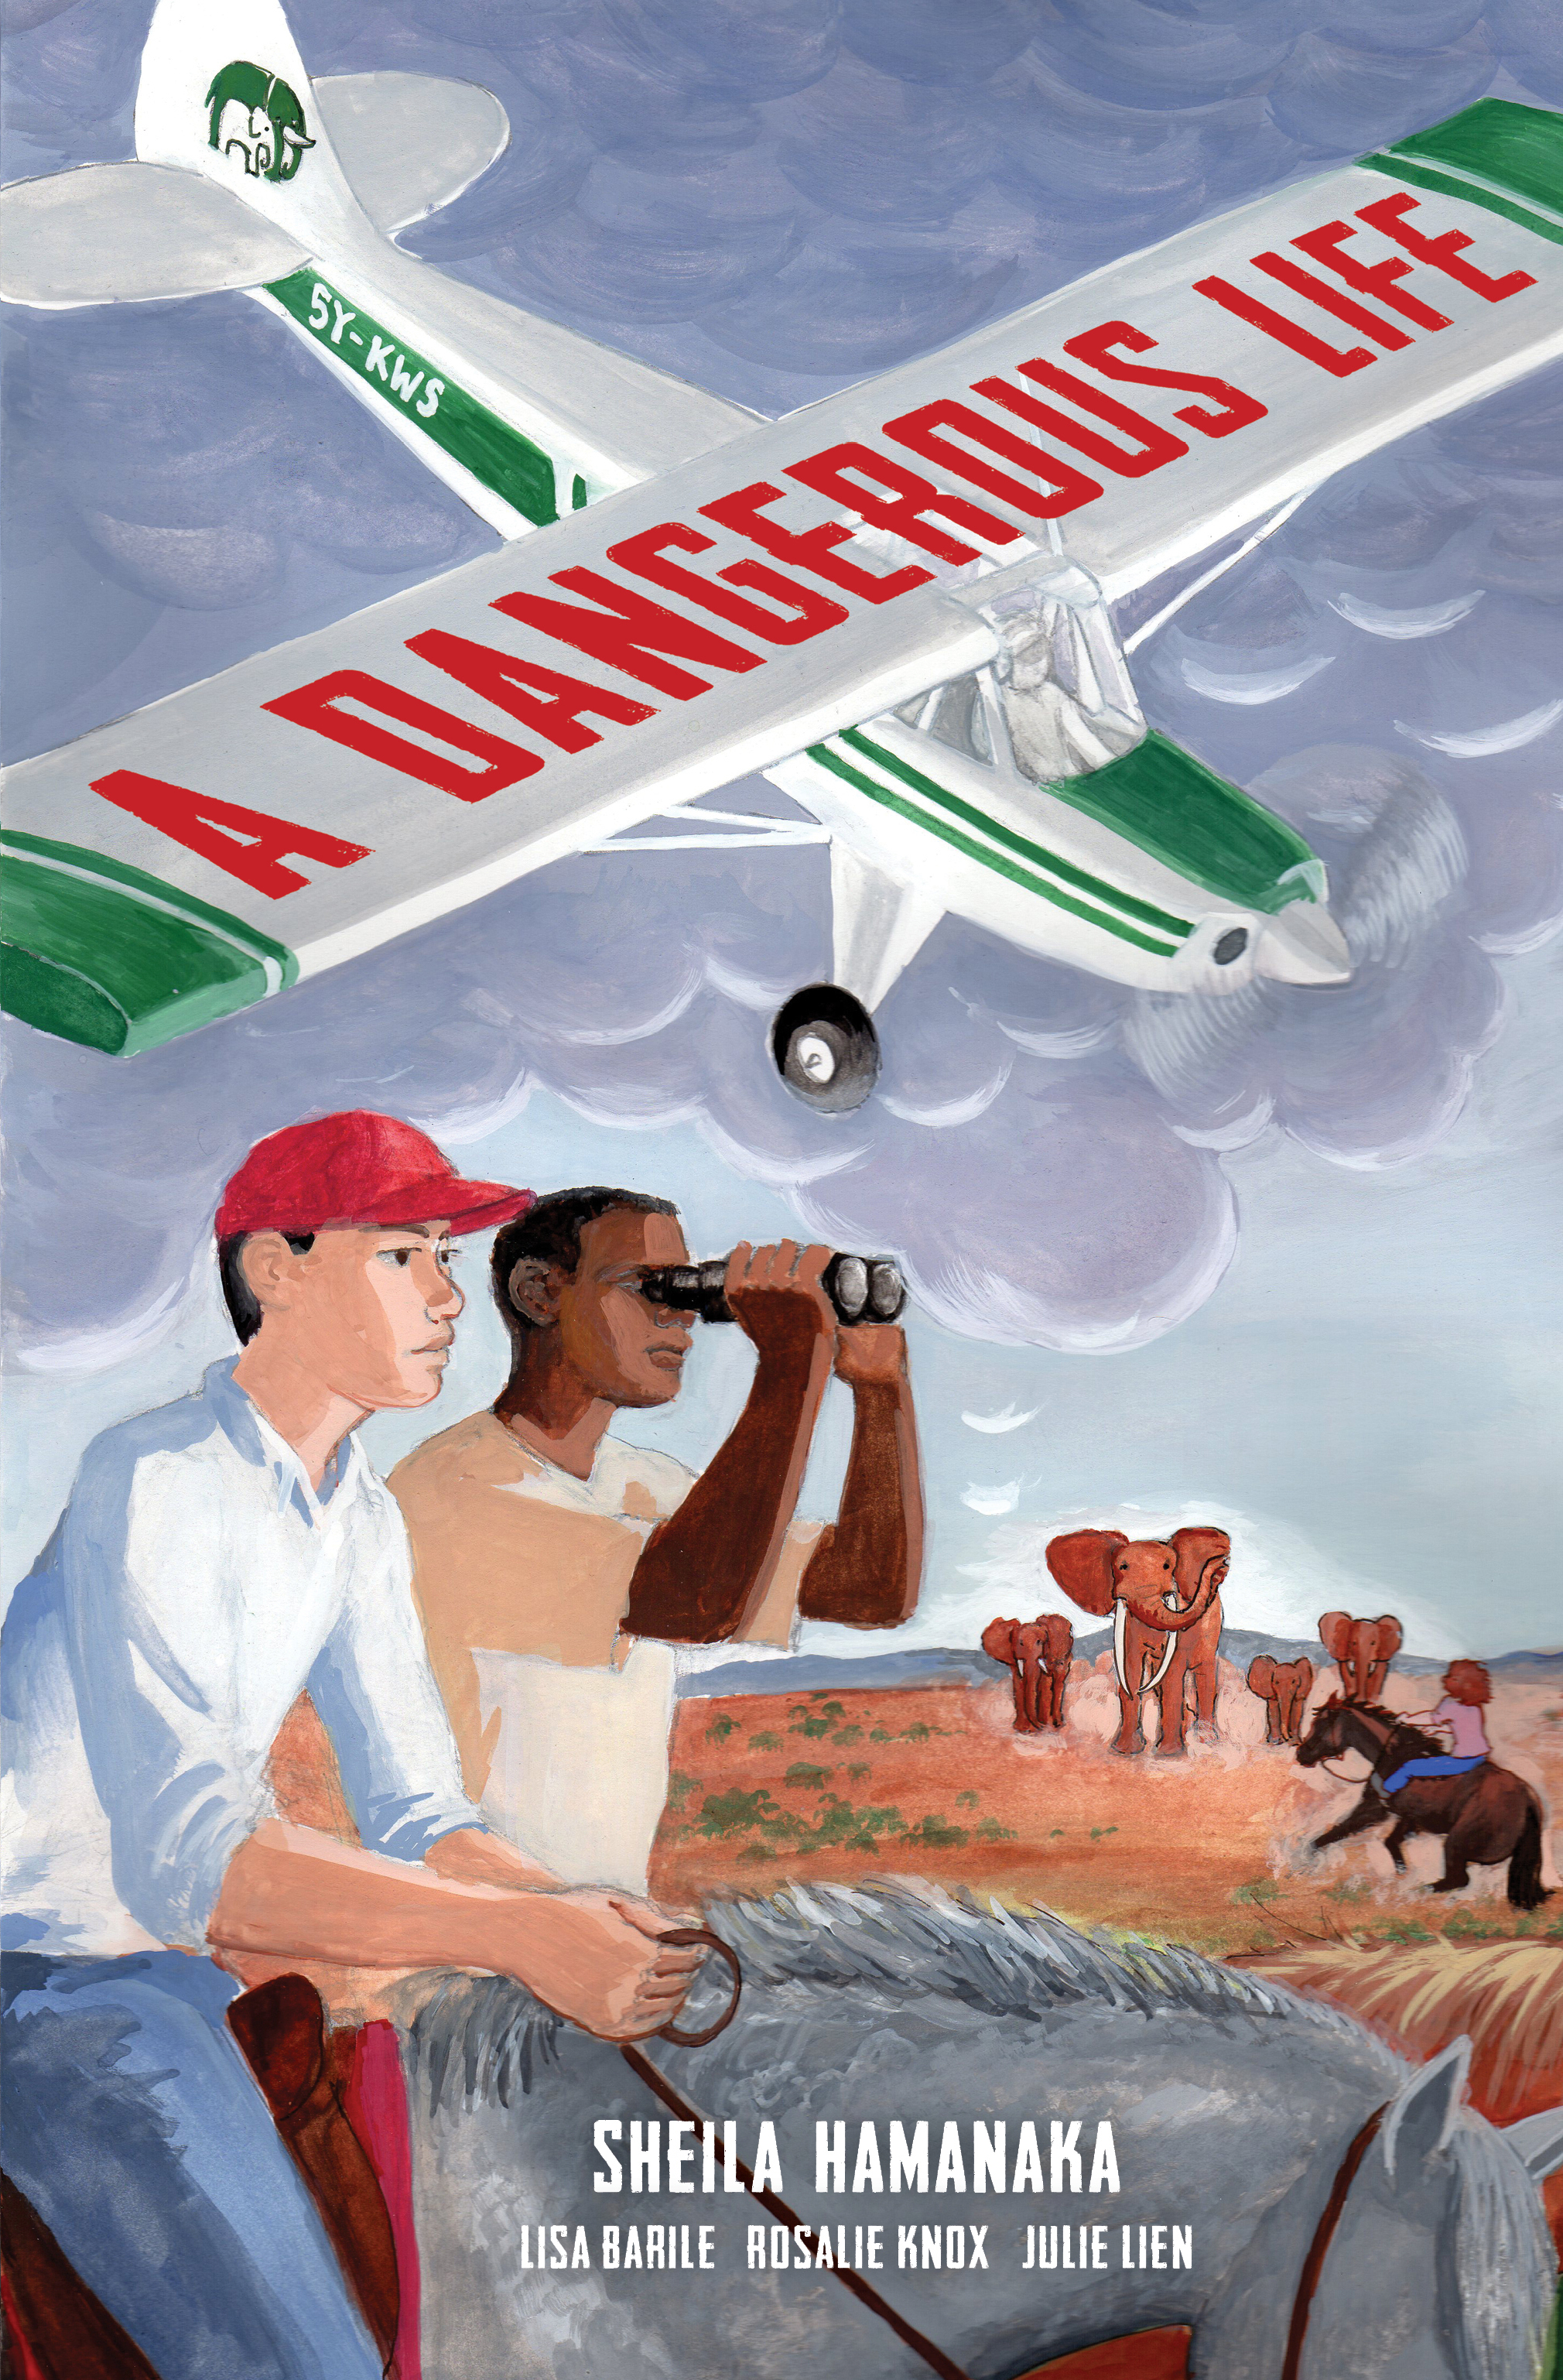 A Dangerous Life Cover - Sheila Hamanaka